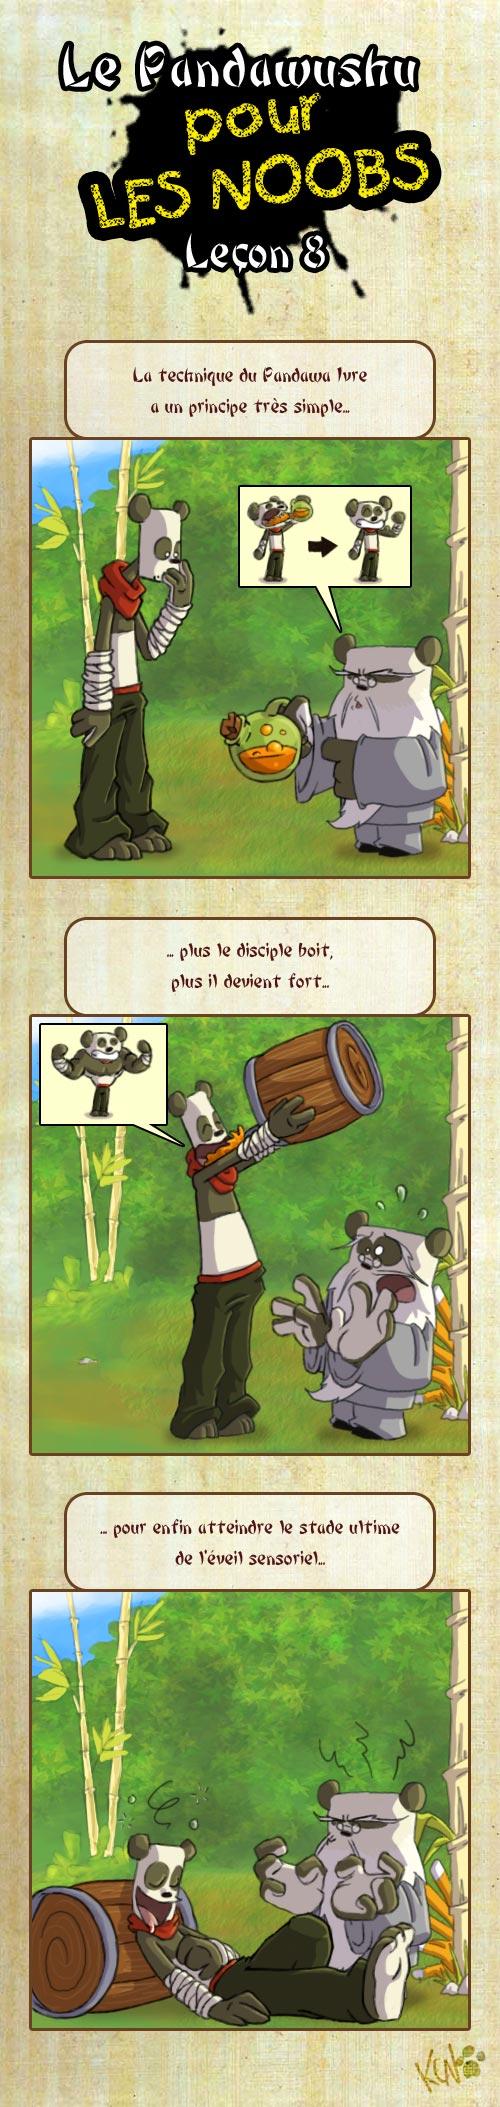 Le Pandawushu pour les Noobs Pandawushu08